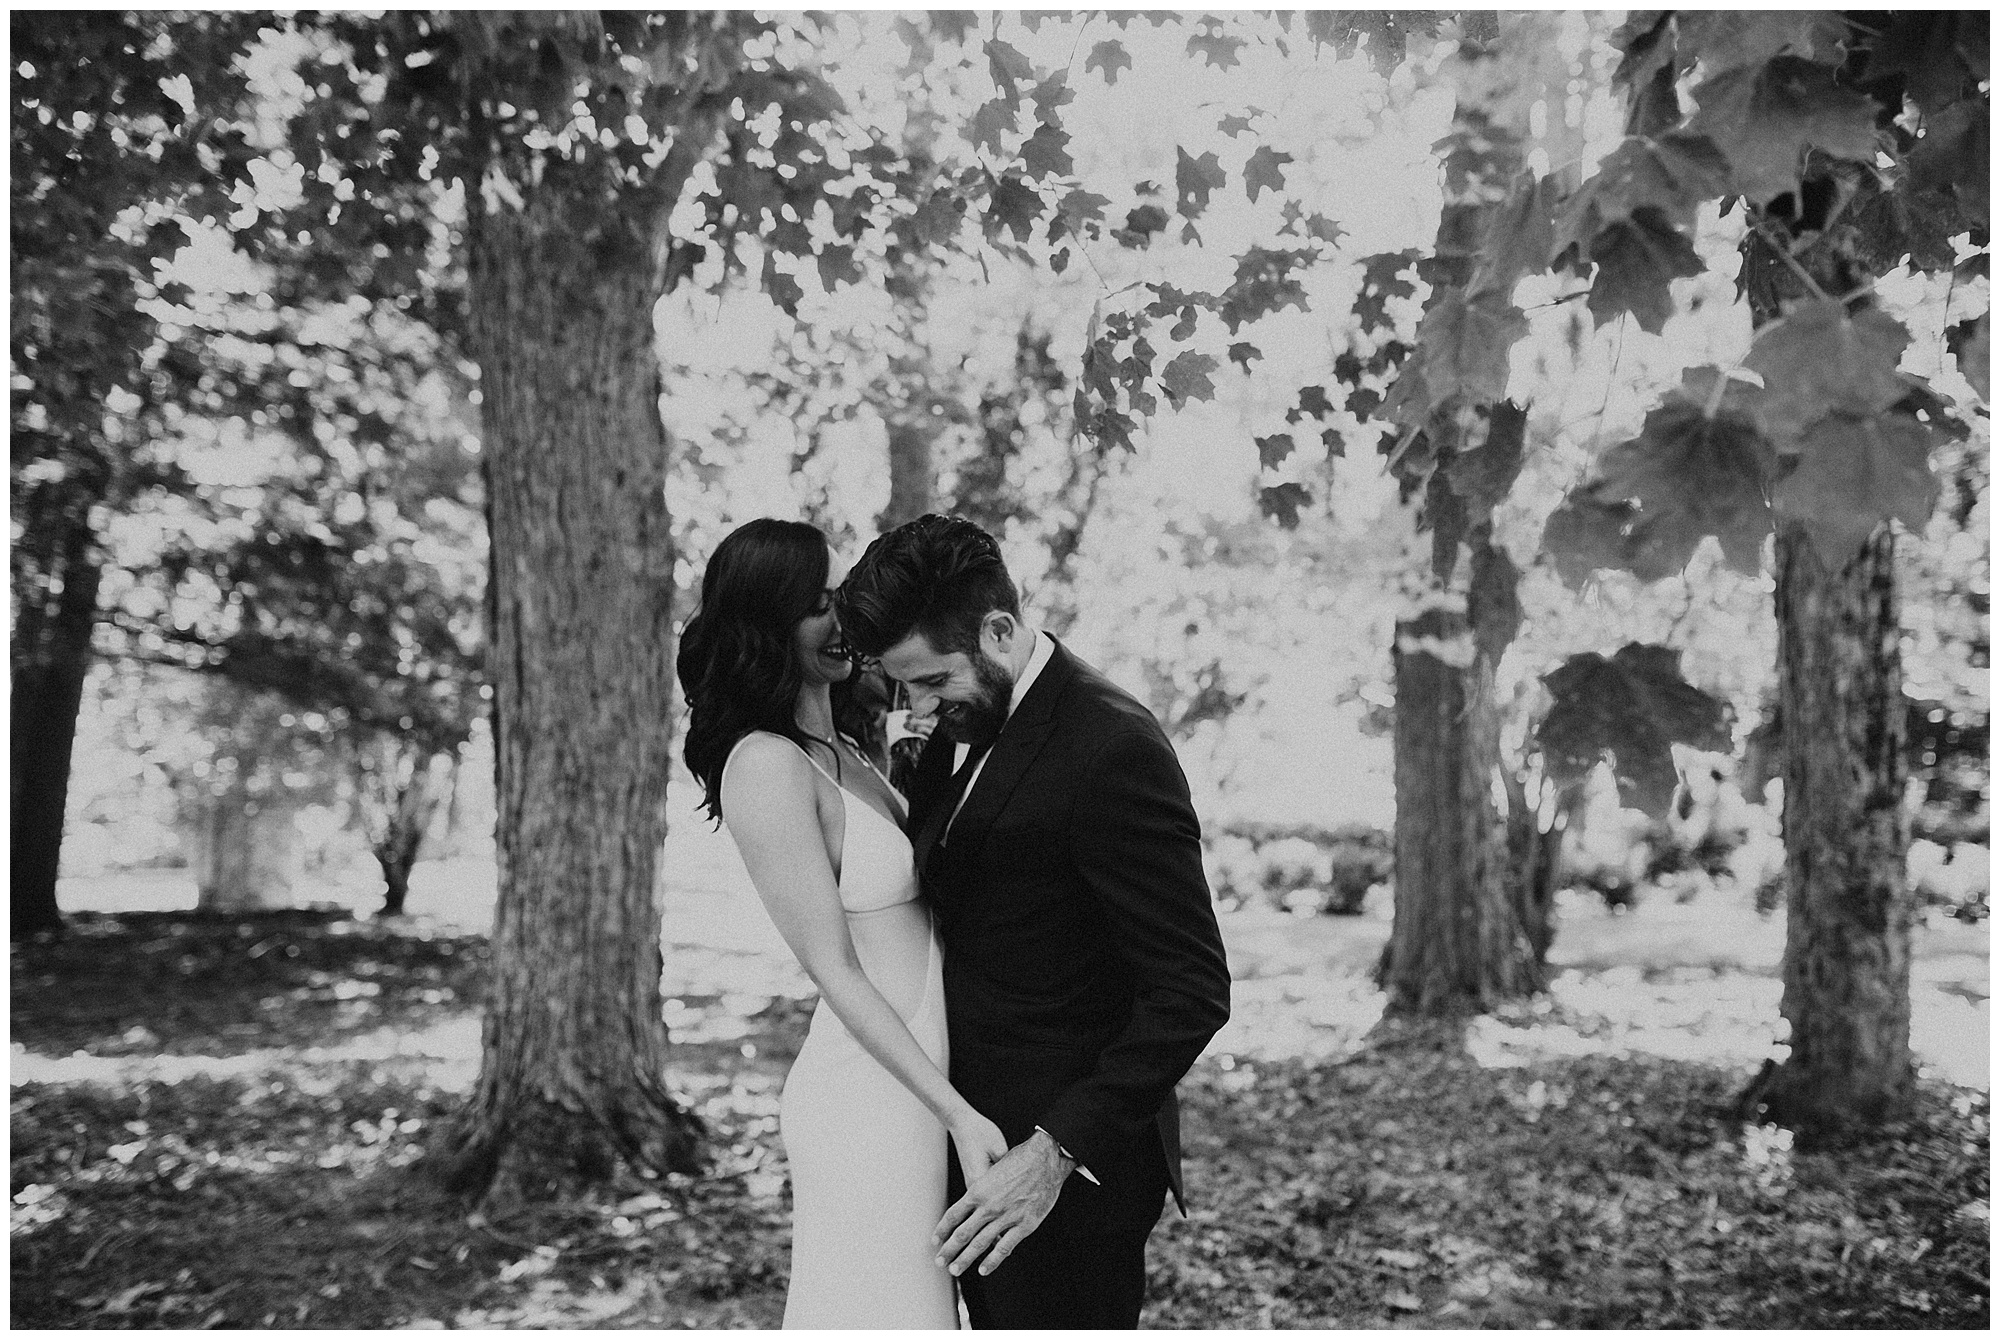 allerton_park_wedding_champaign_il_chicago_wright_photographs_ne_0050.jpg